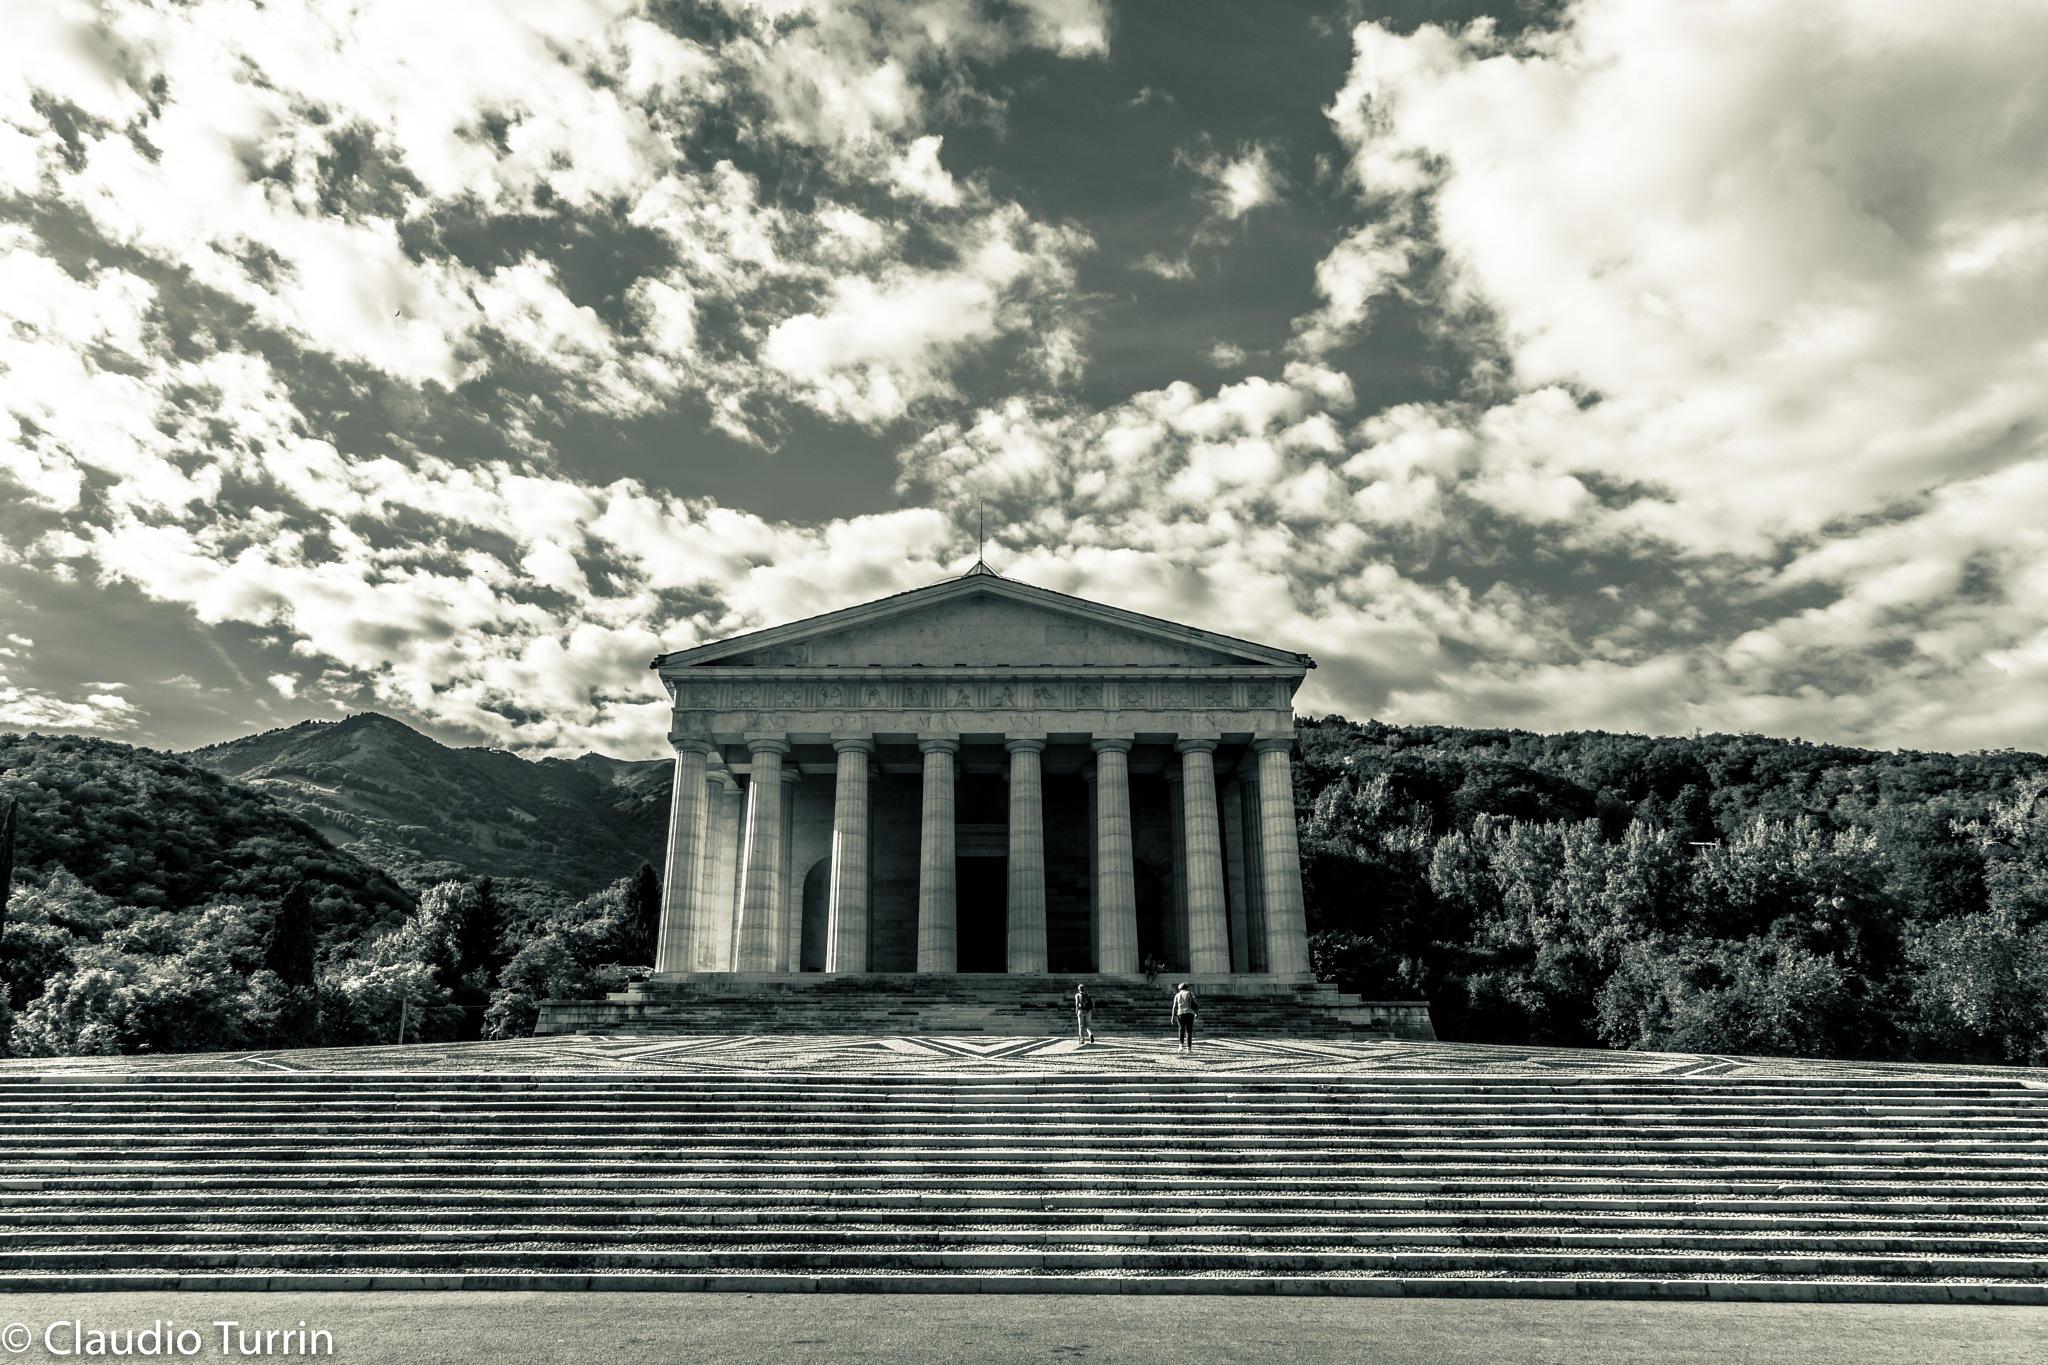 Tempio del Canova n°1 by claudioturrin77